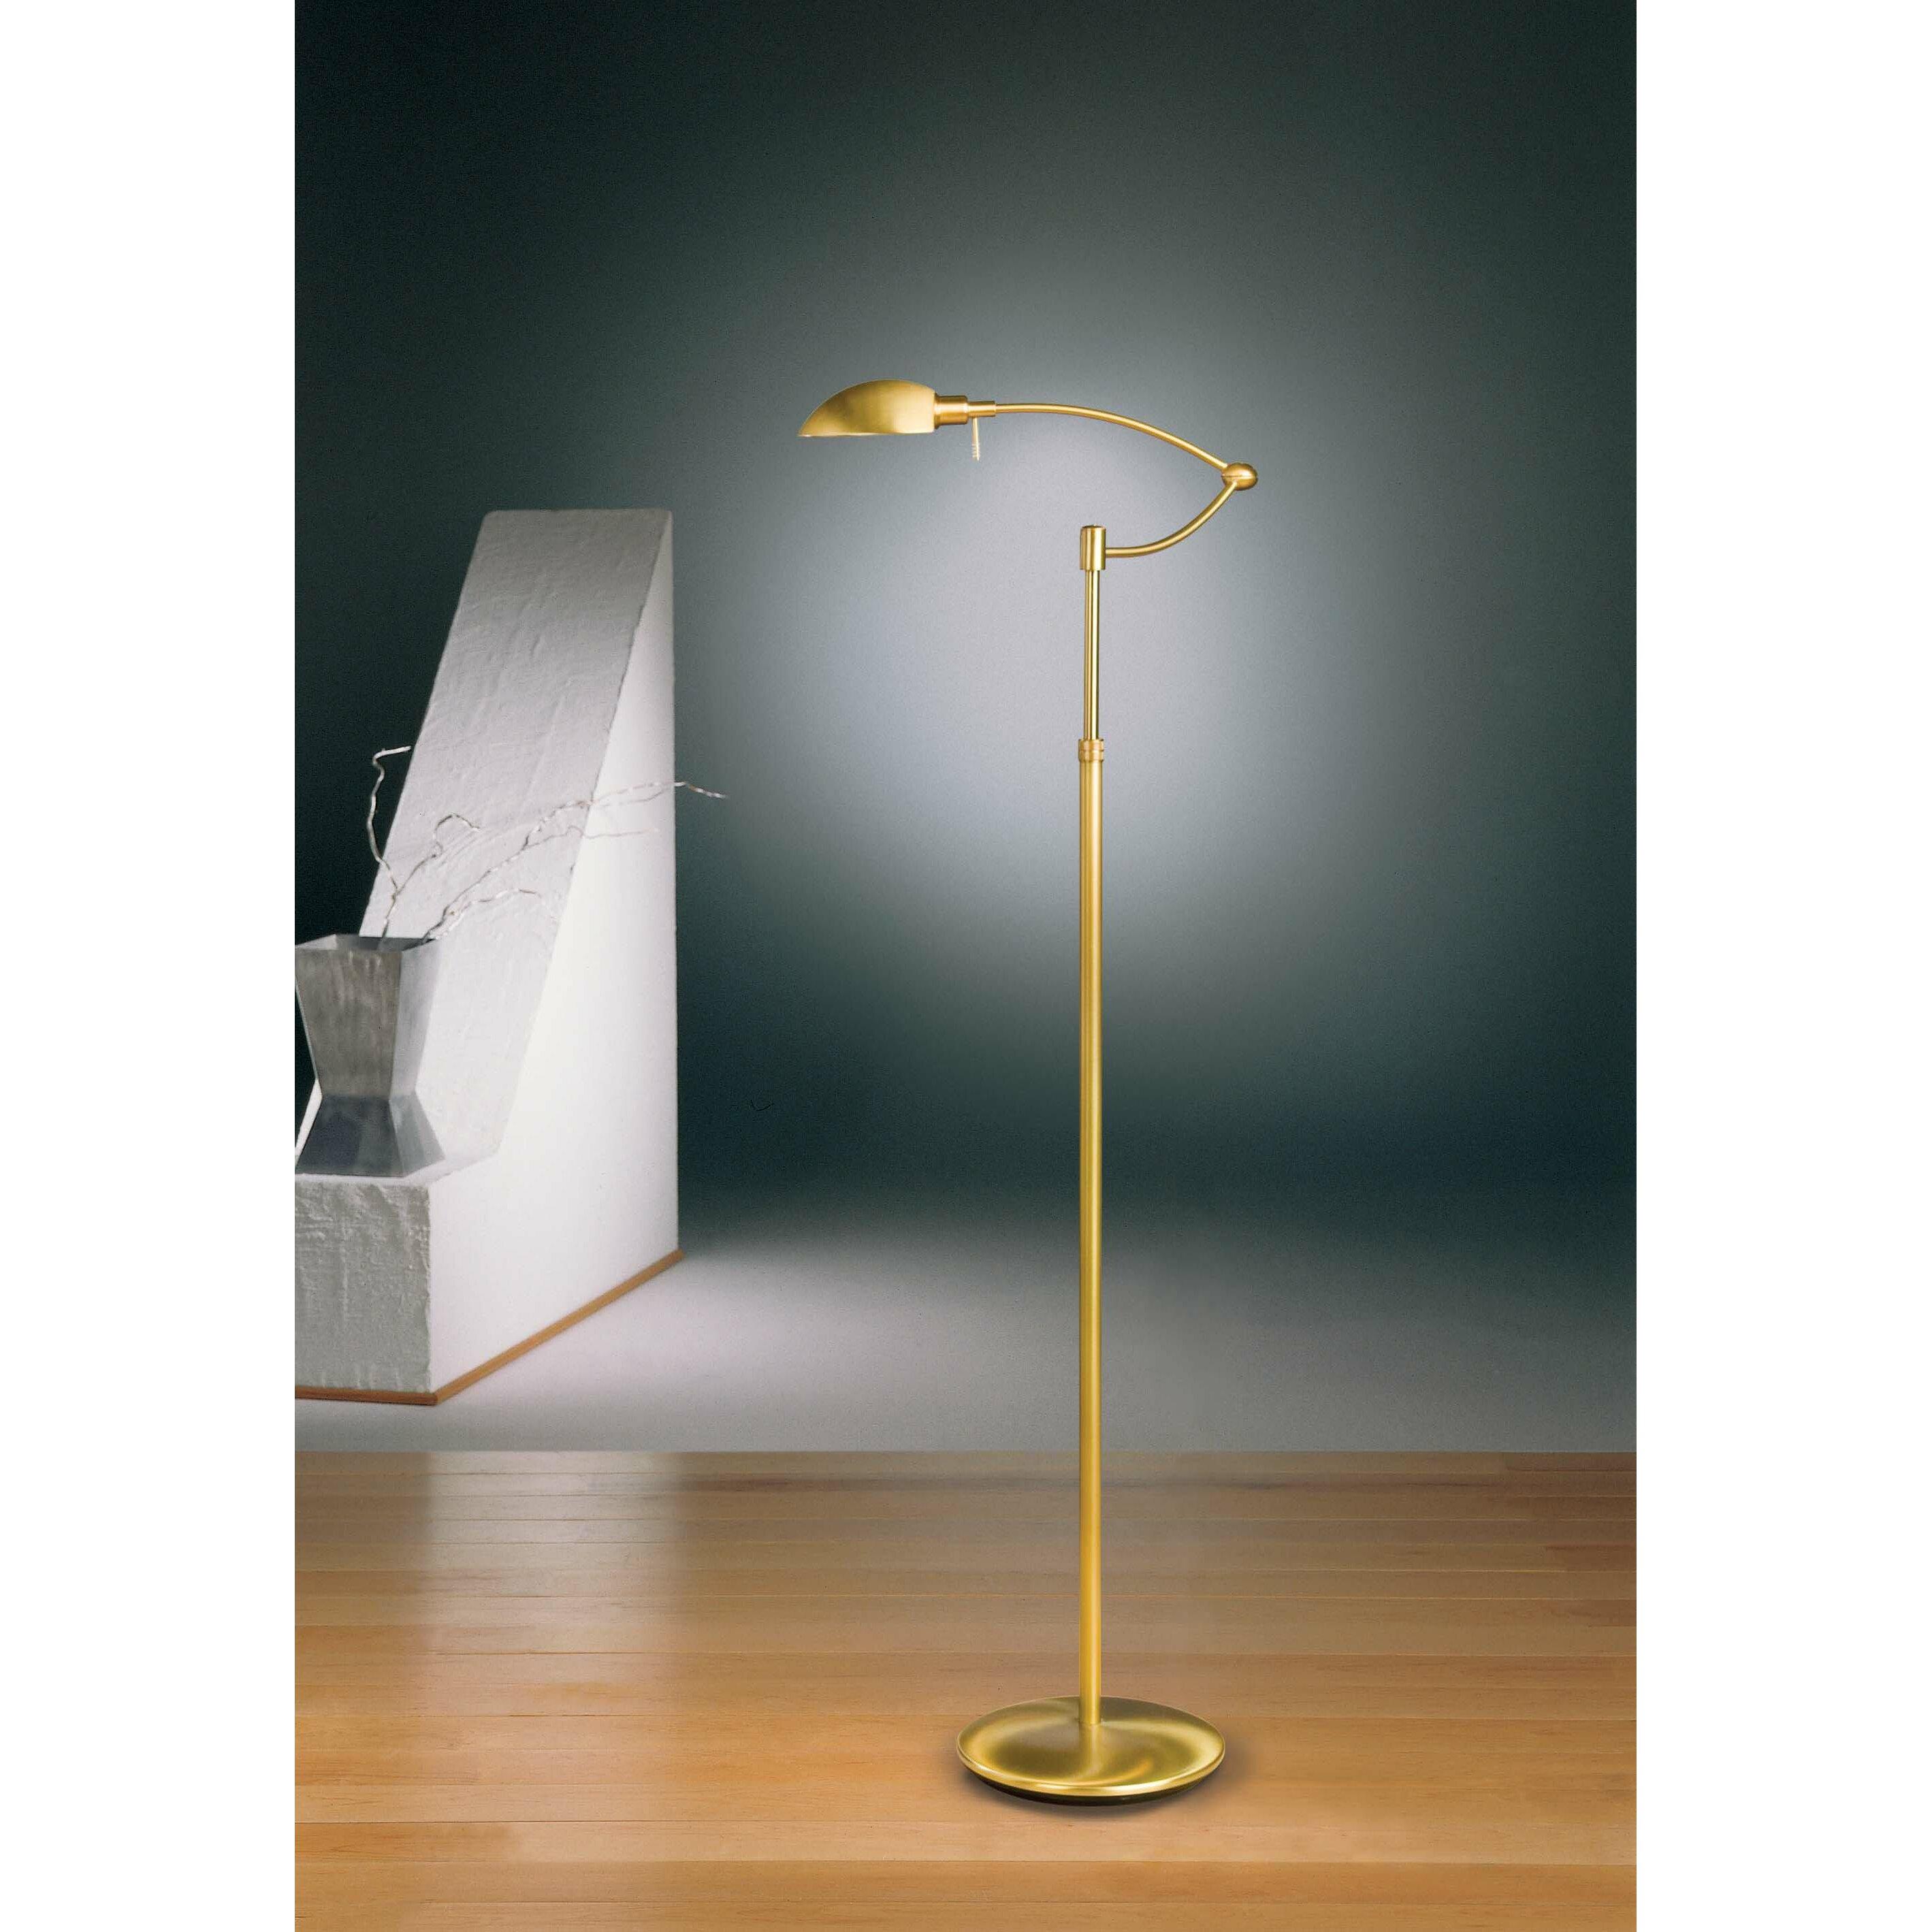 light reading pharmacy floor lamp. Black Bedroom Furniture Sets. Home Design Ideas